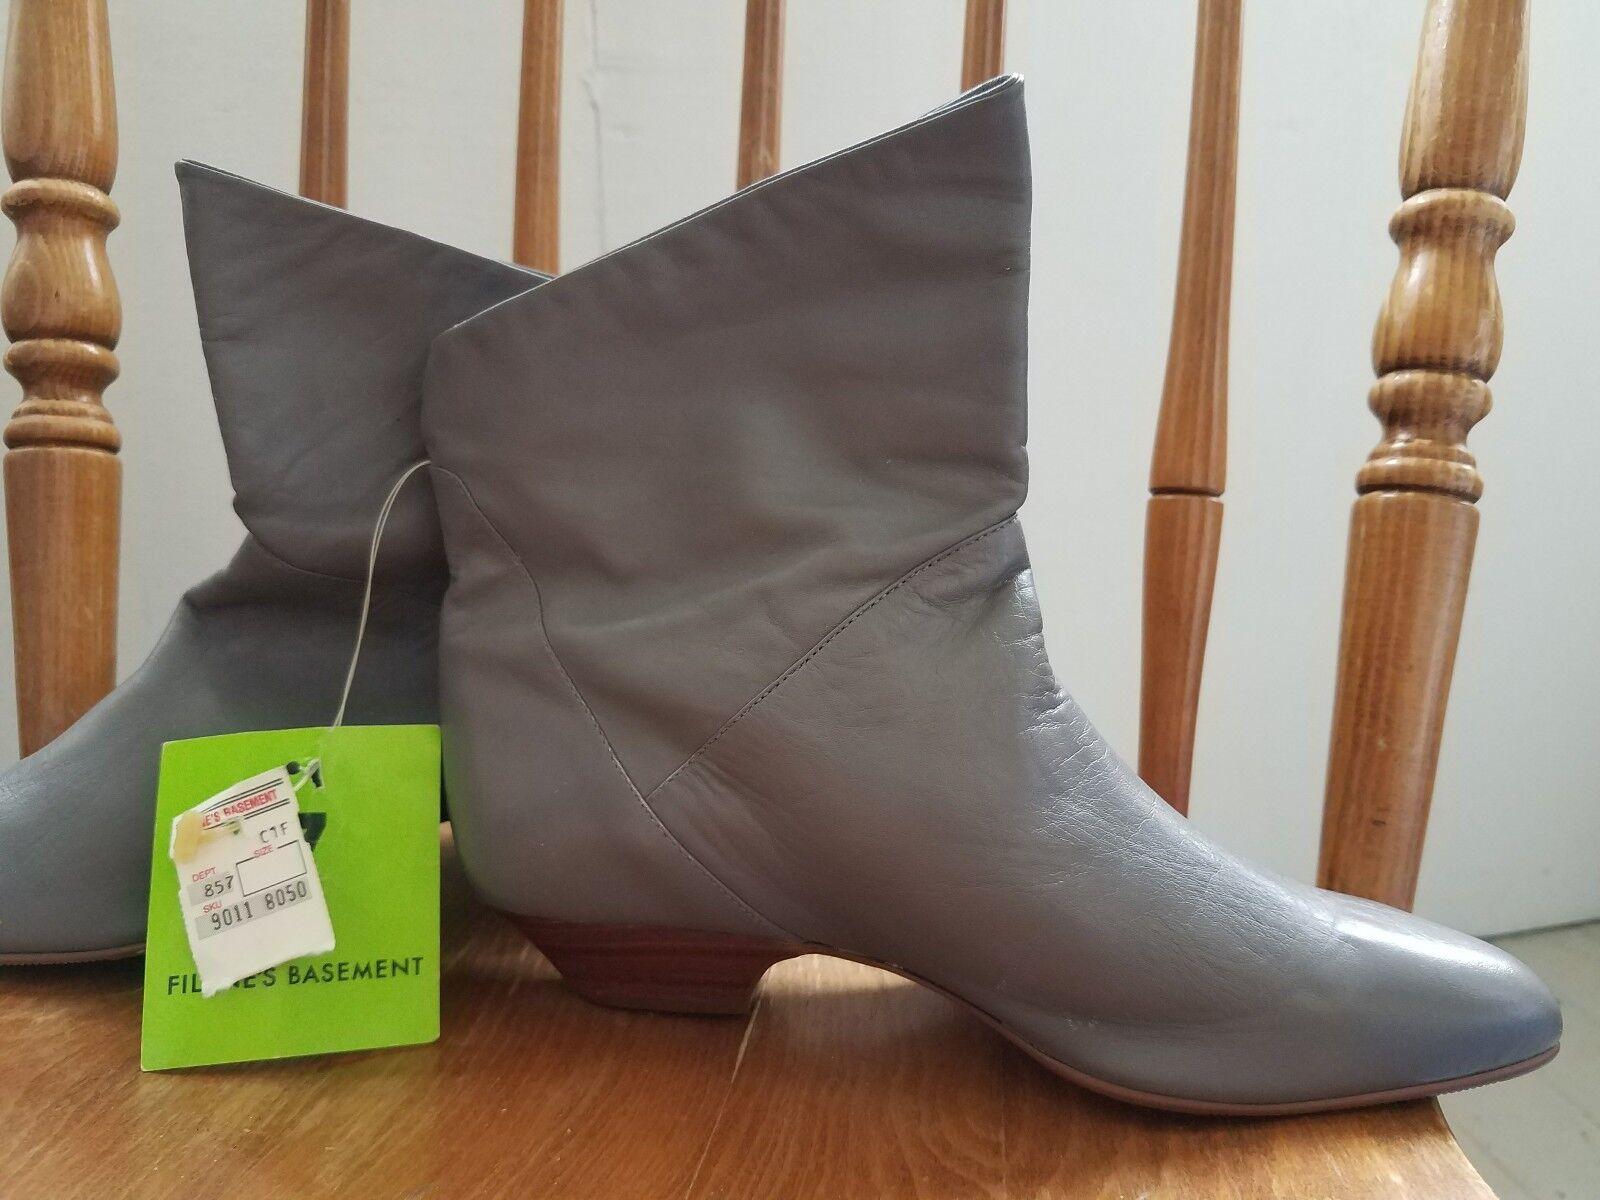 Catleia Ankle Stiefel Grau Größe 7B made in Brazil